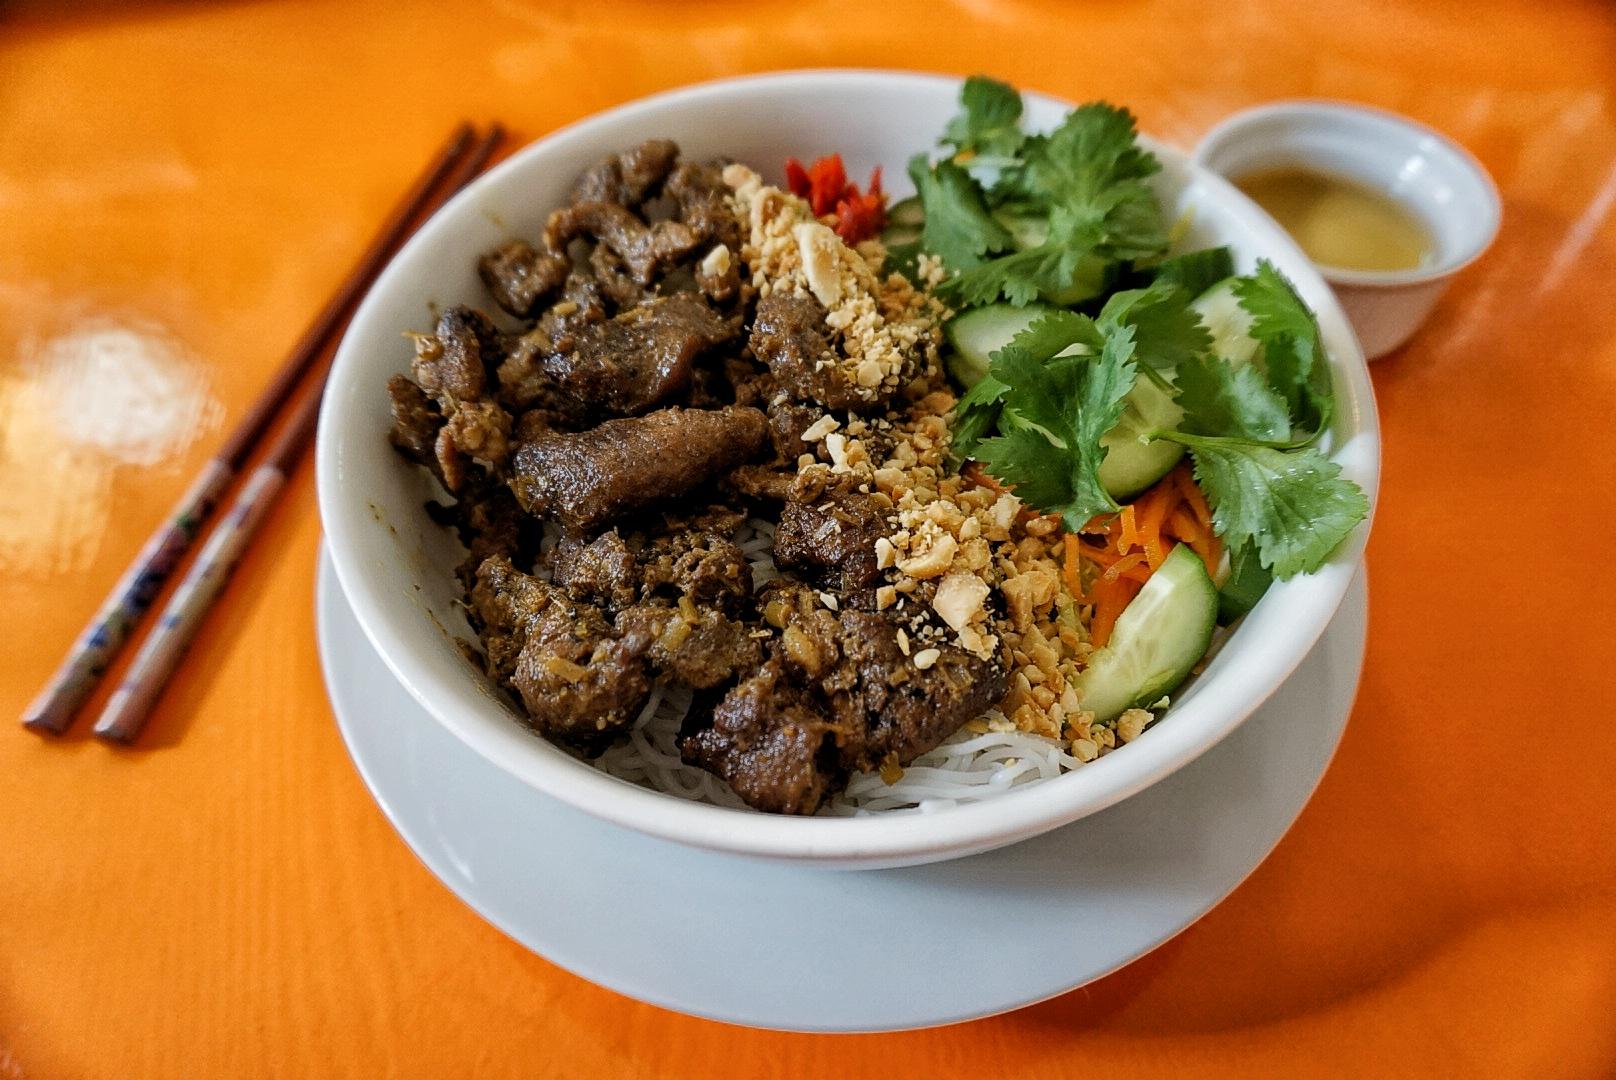 grilled pork belly noodles at Panda Panda